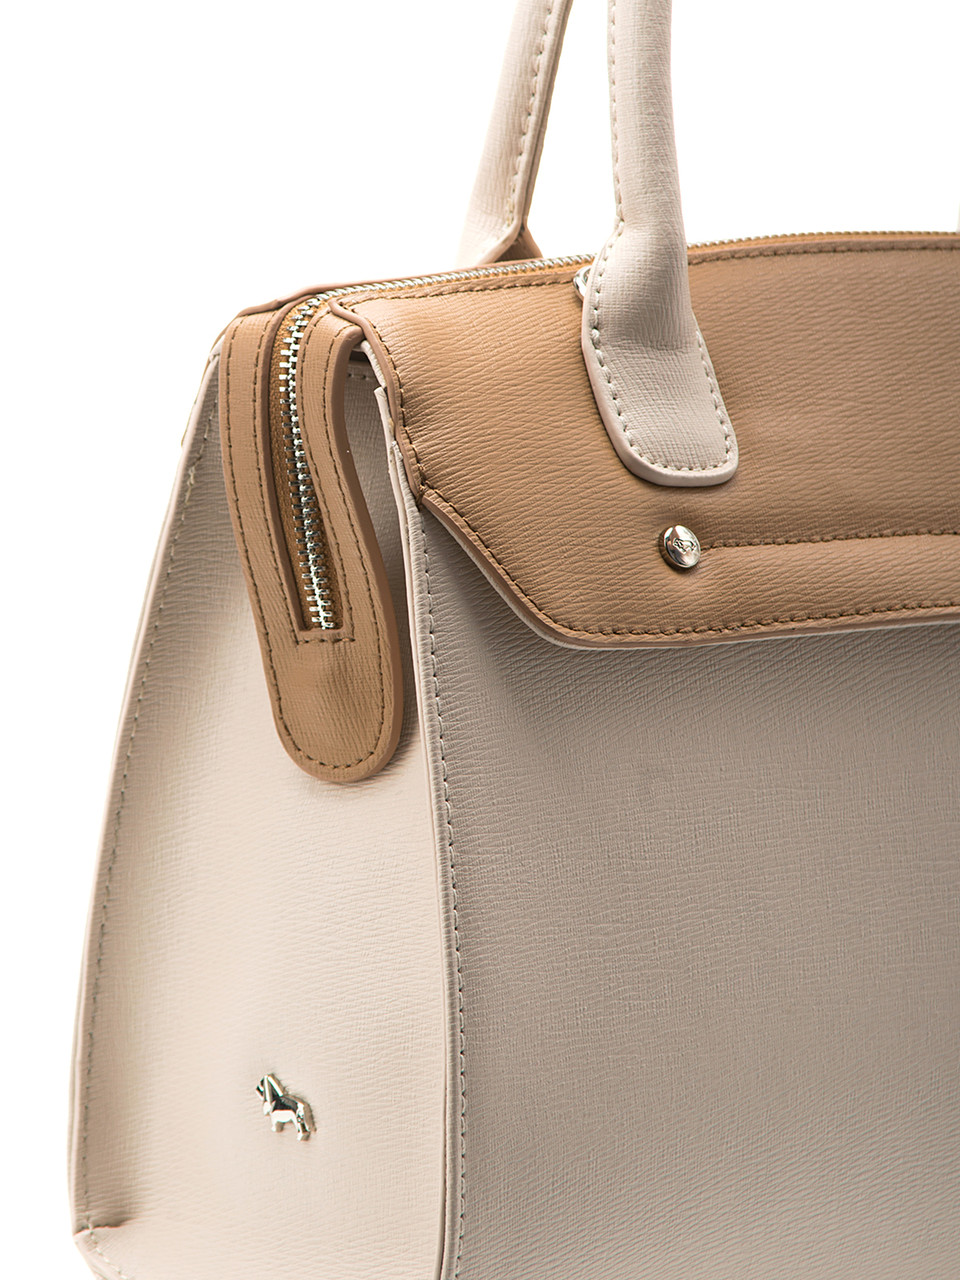 d30f6b6f465e Светлая сумка женская кожаная L-2150-2, цена 4 687,20 грн., купить в  Харькове — Prom.ua (ID#690153435)